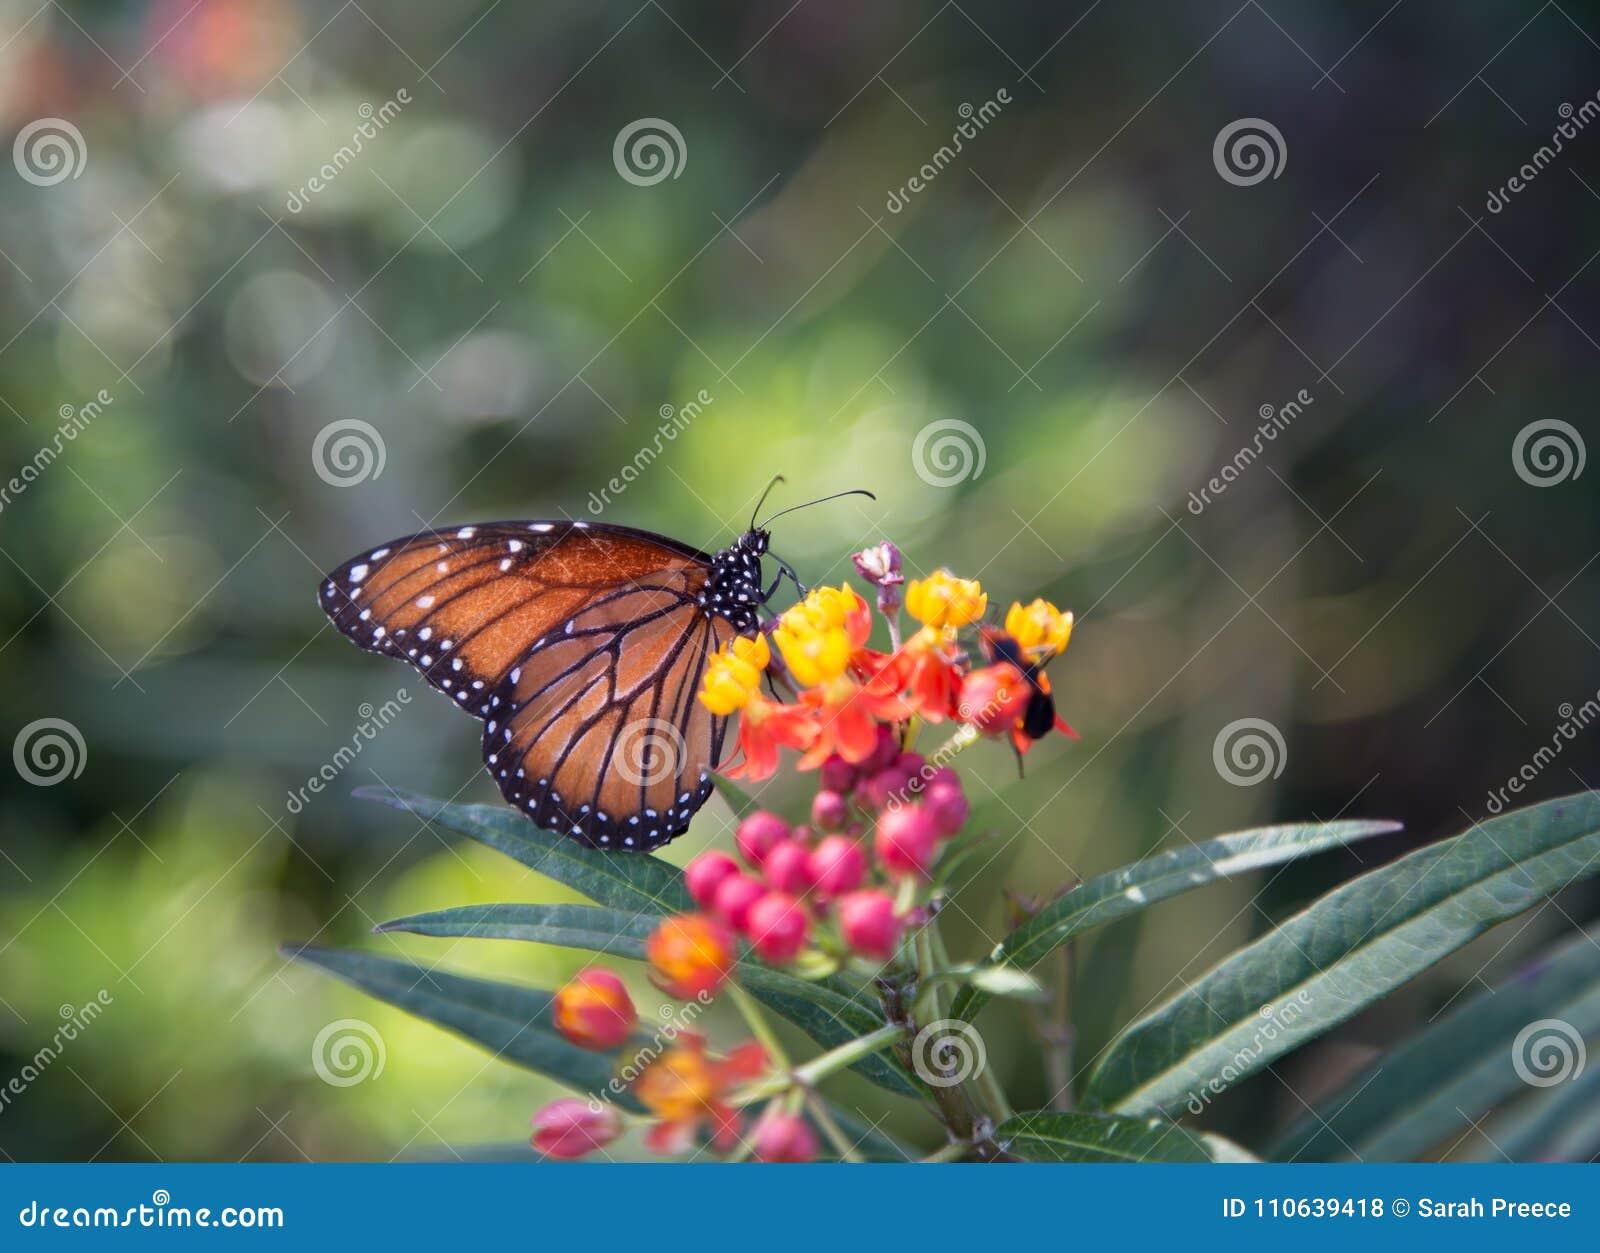 One Monarch butterfly on flowers